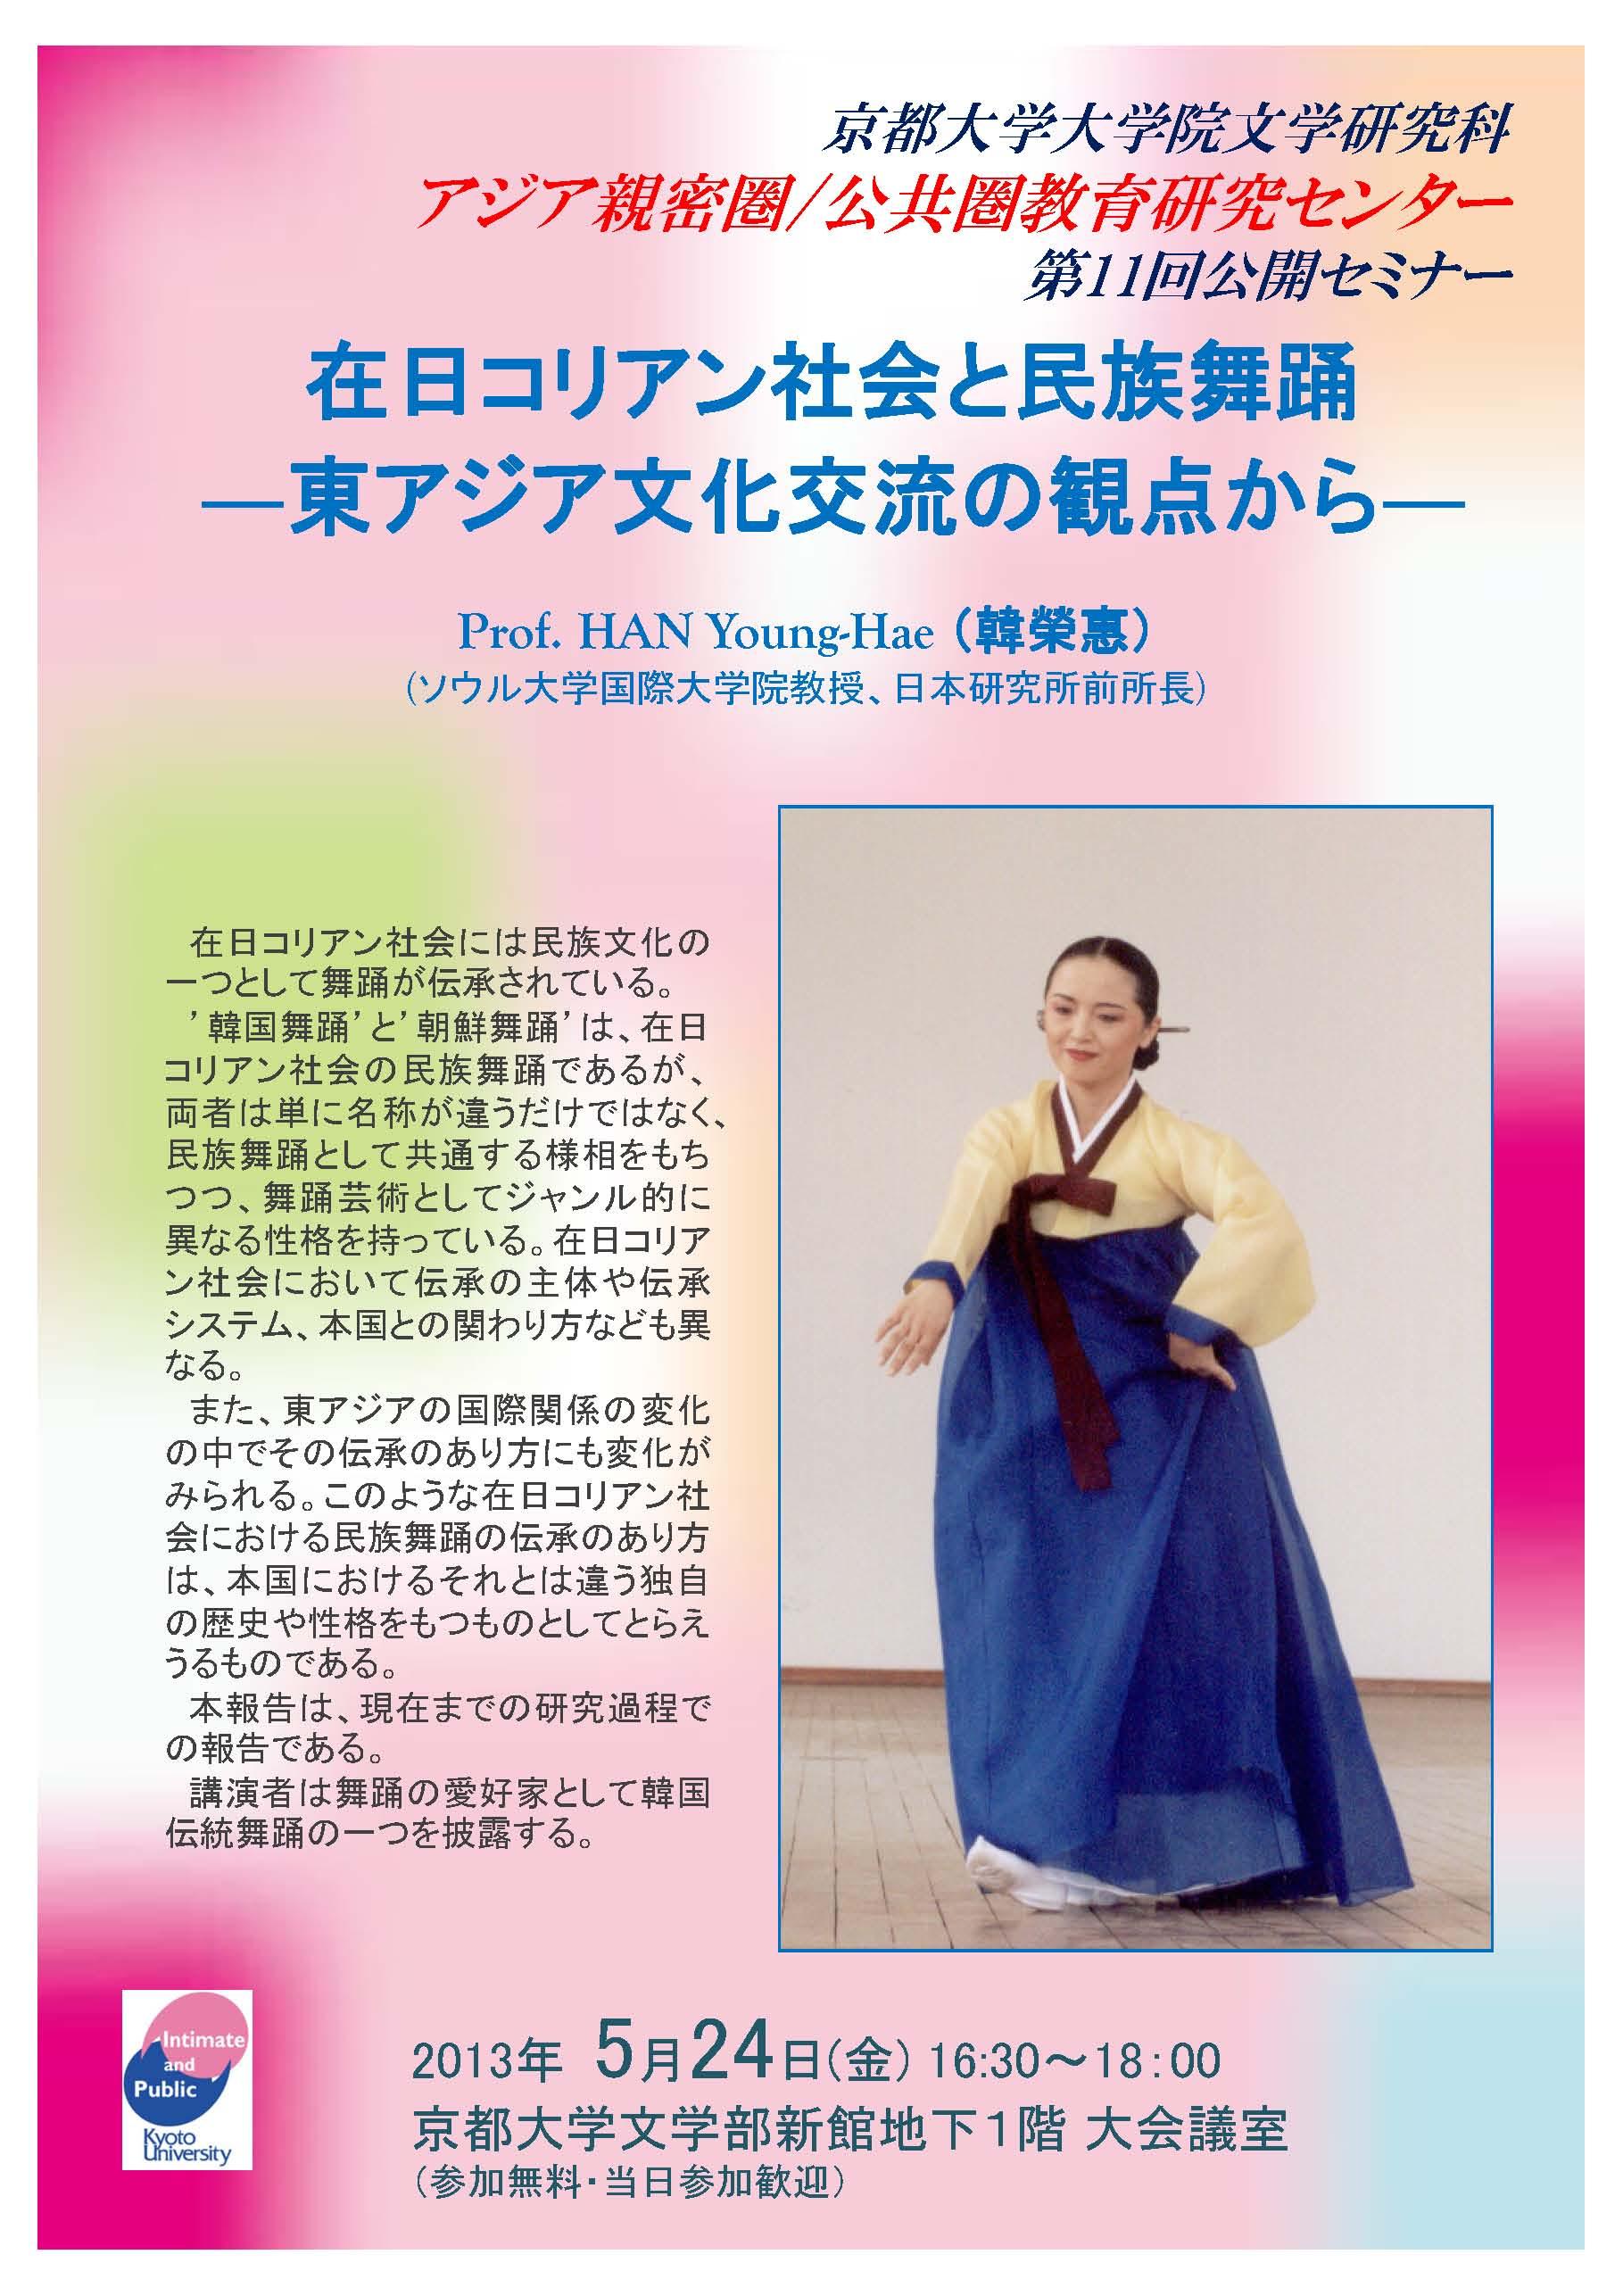 20130524HAN Young-Hae 韓榮惠先生セミナー